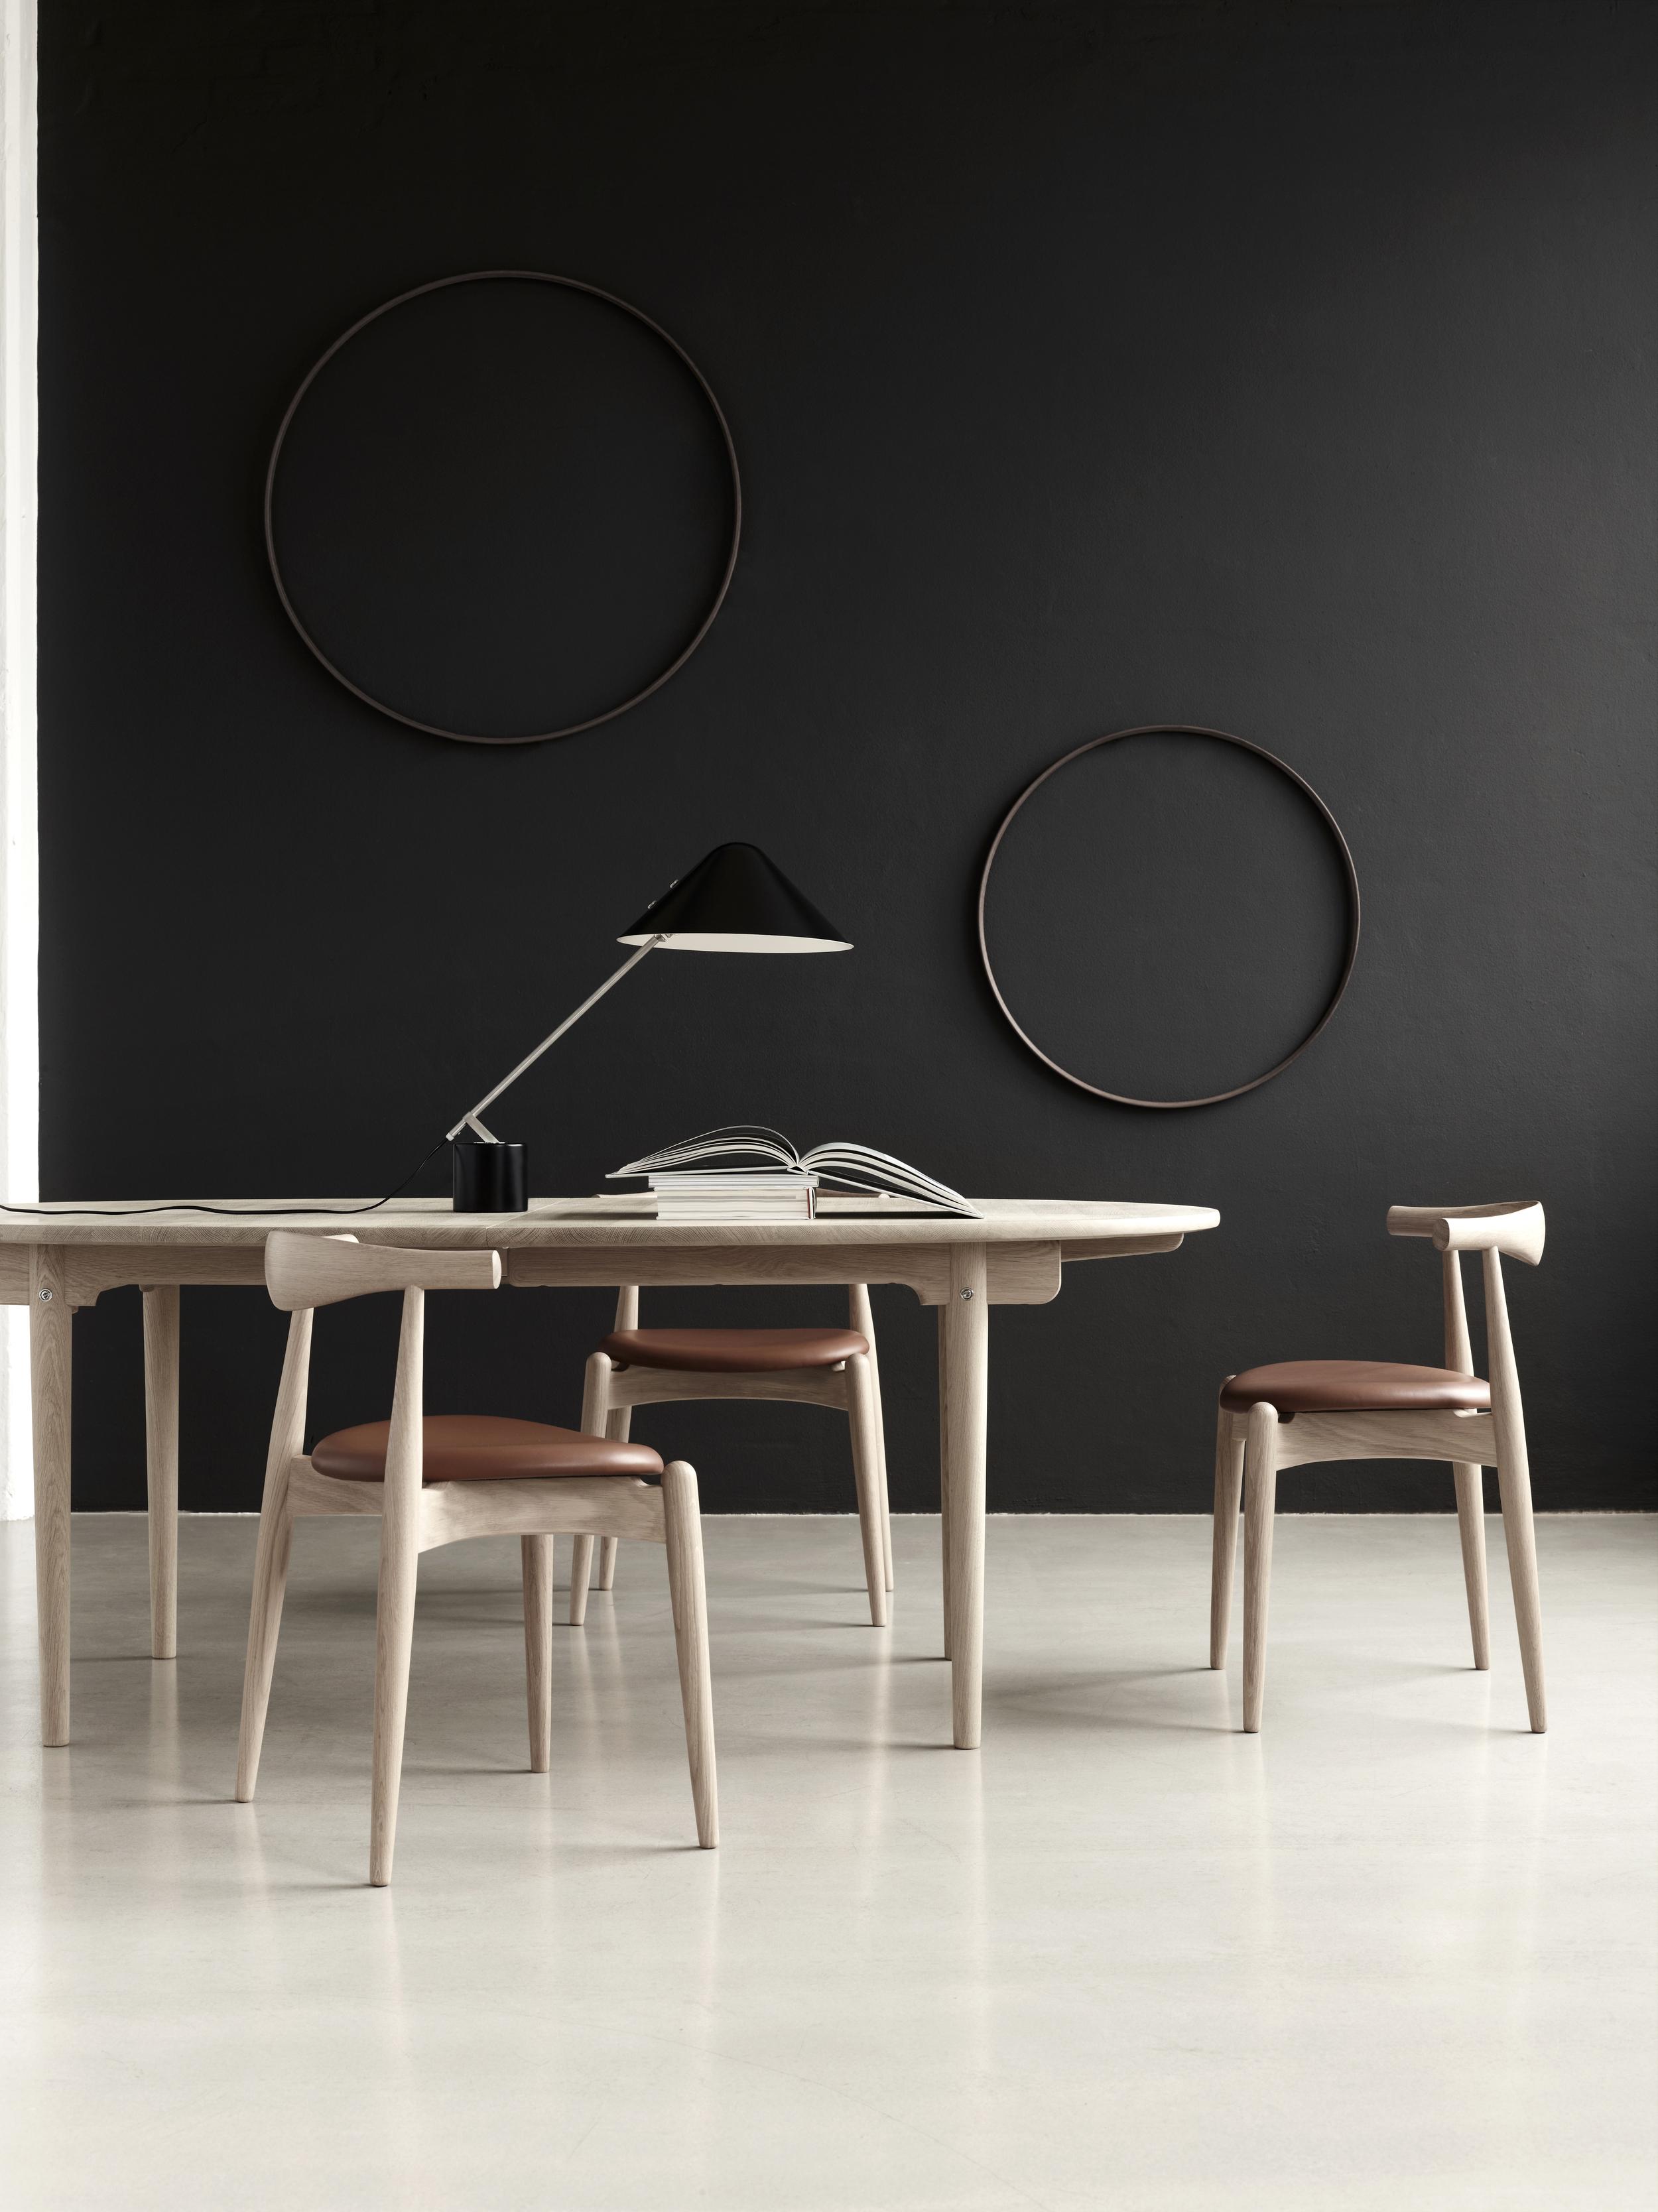 Elbow Chair by Hans Wegner for Carl Hansen